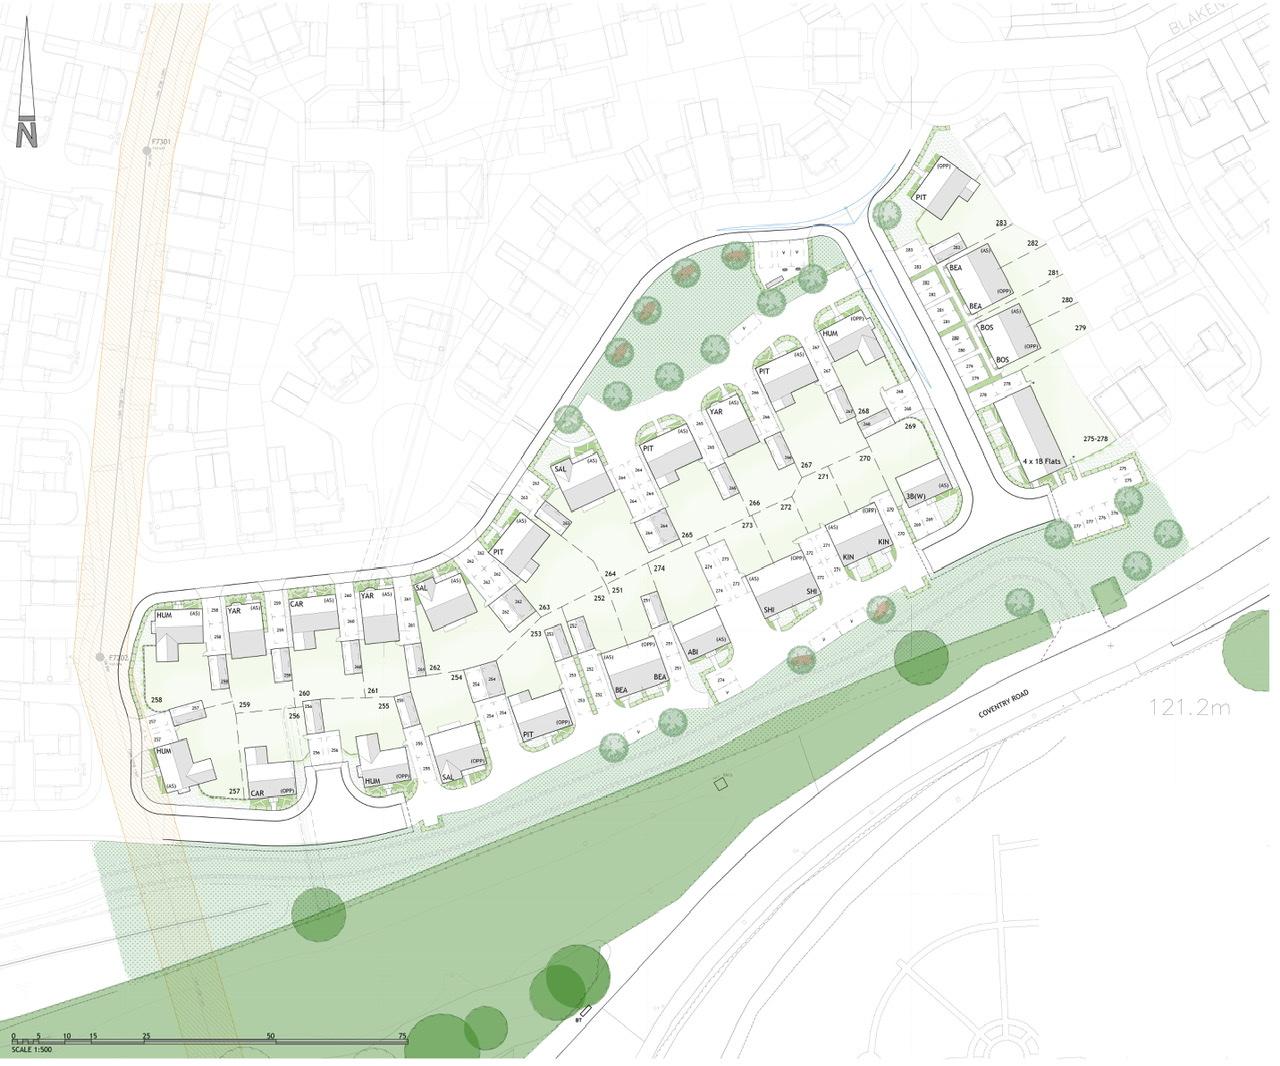 Residential development in Lutterworth